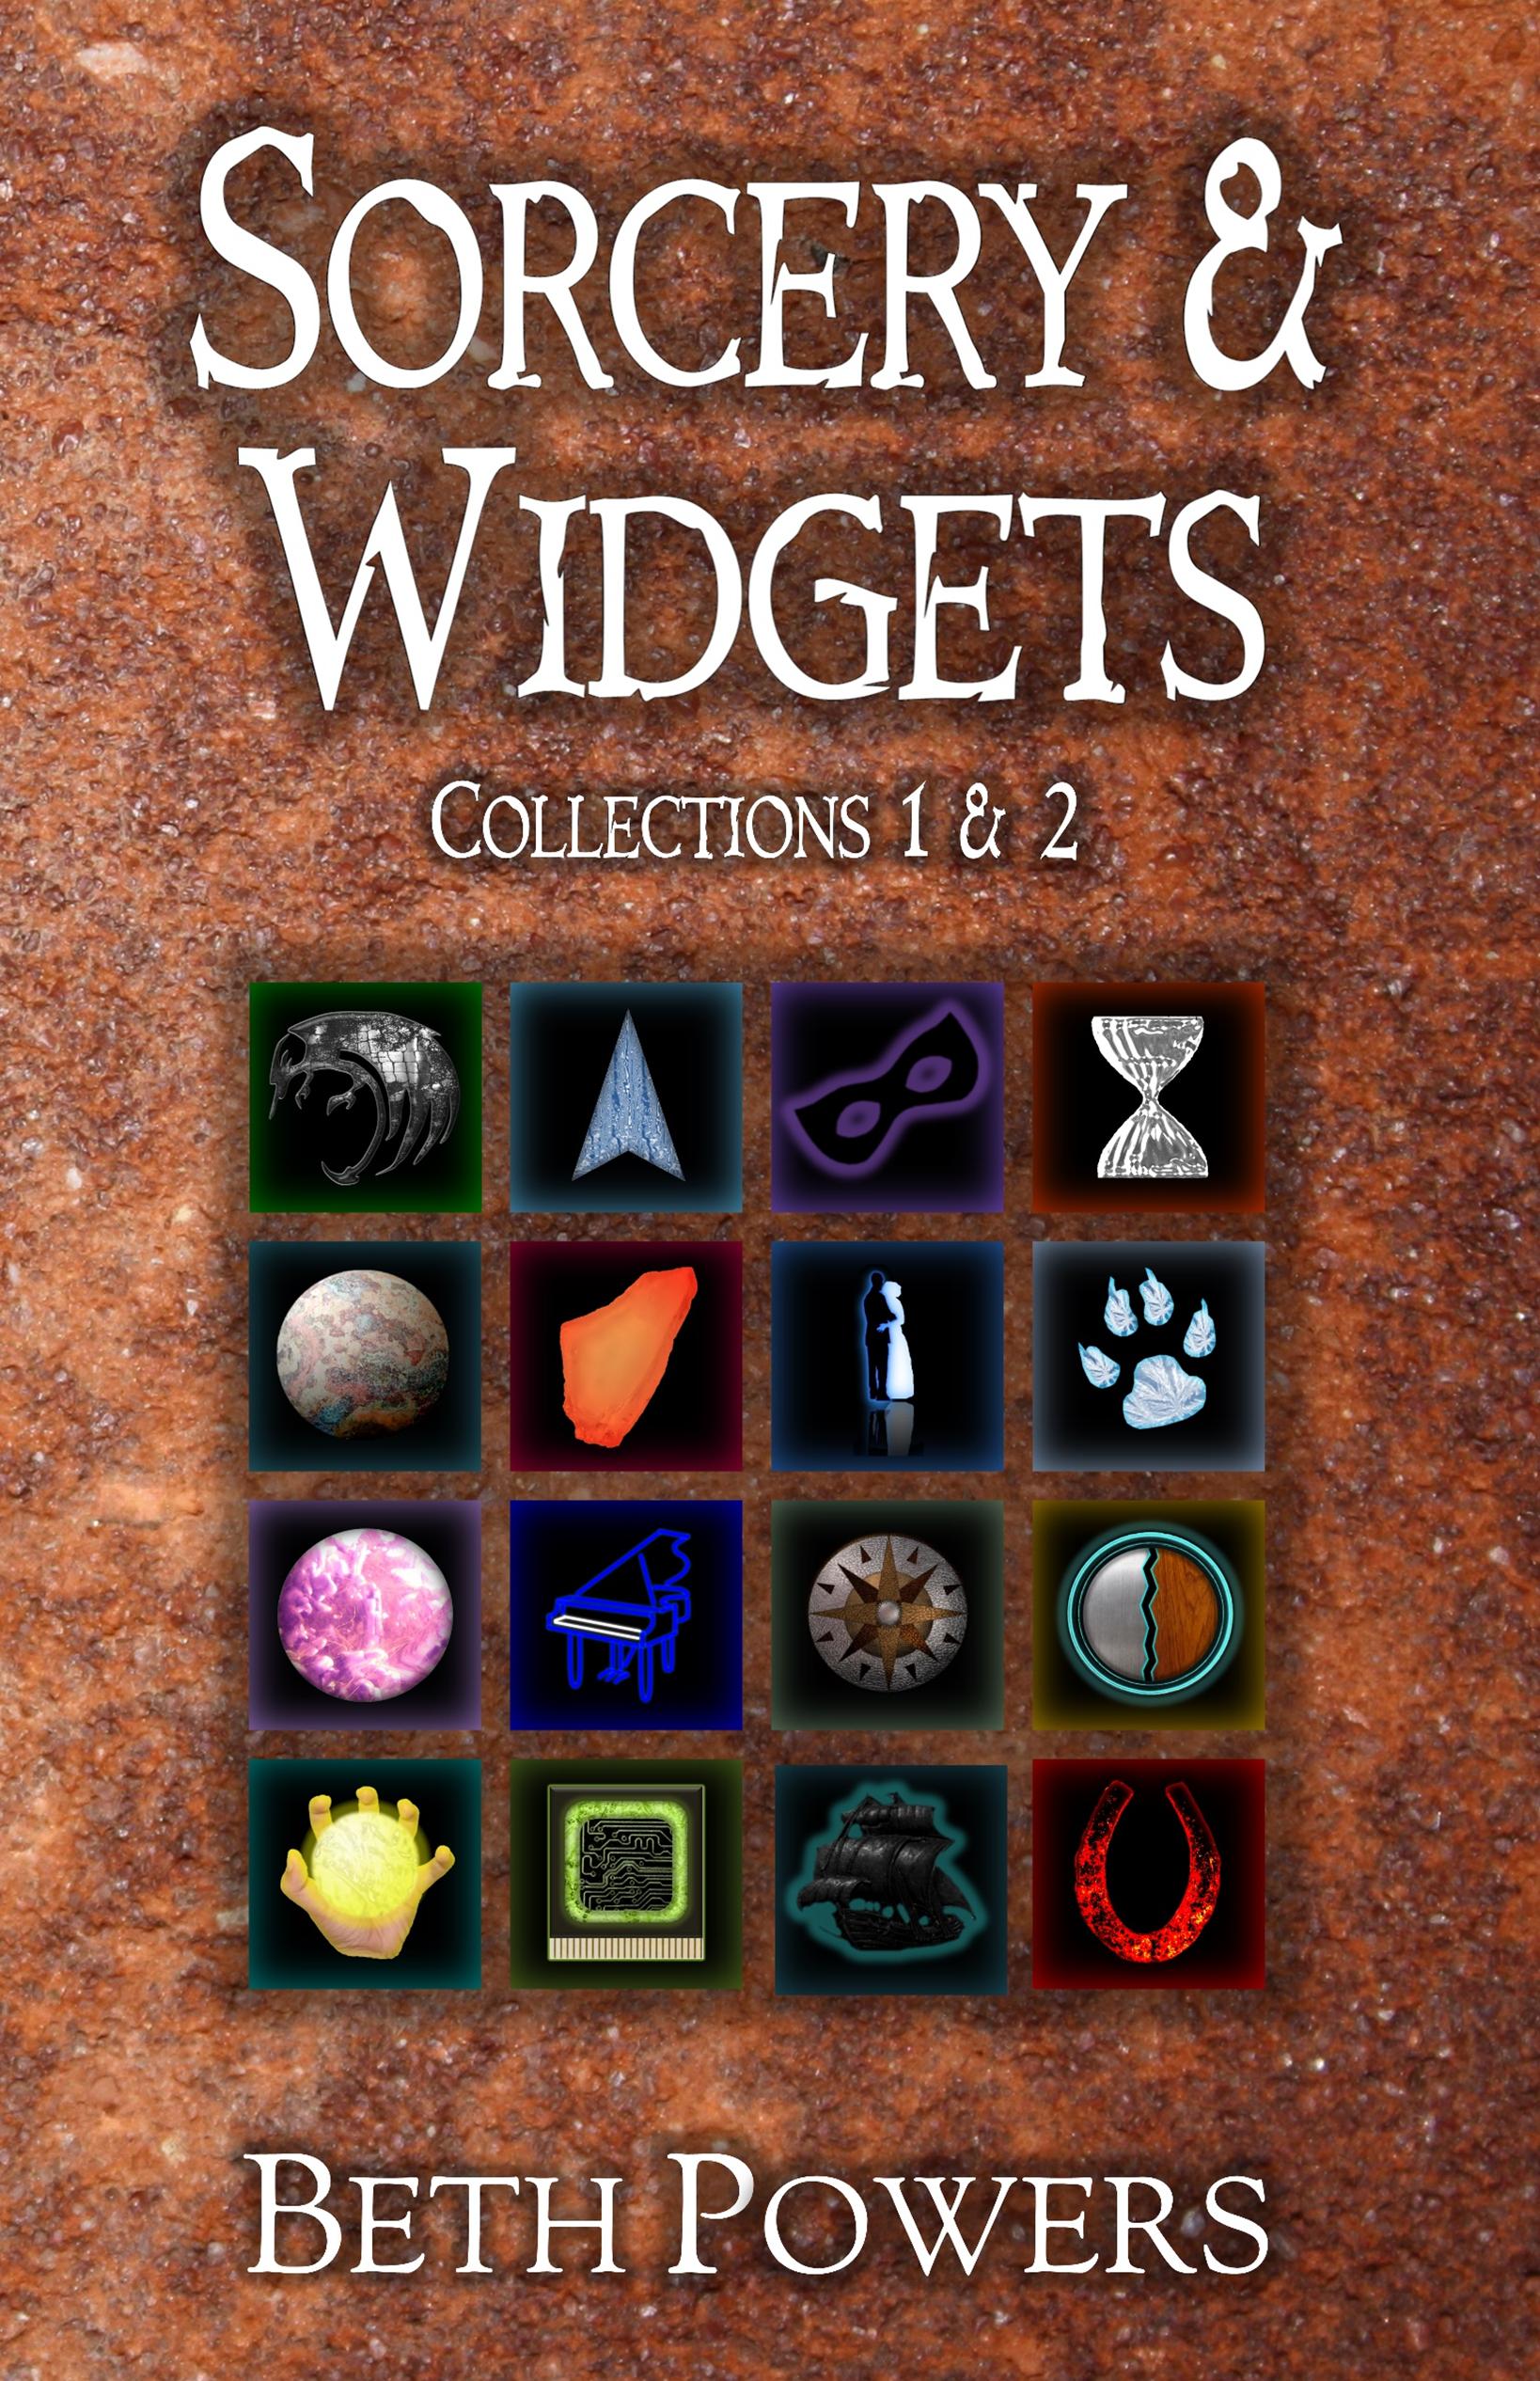 Sorcery & Widgets